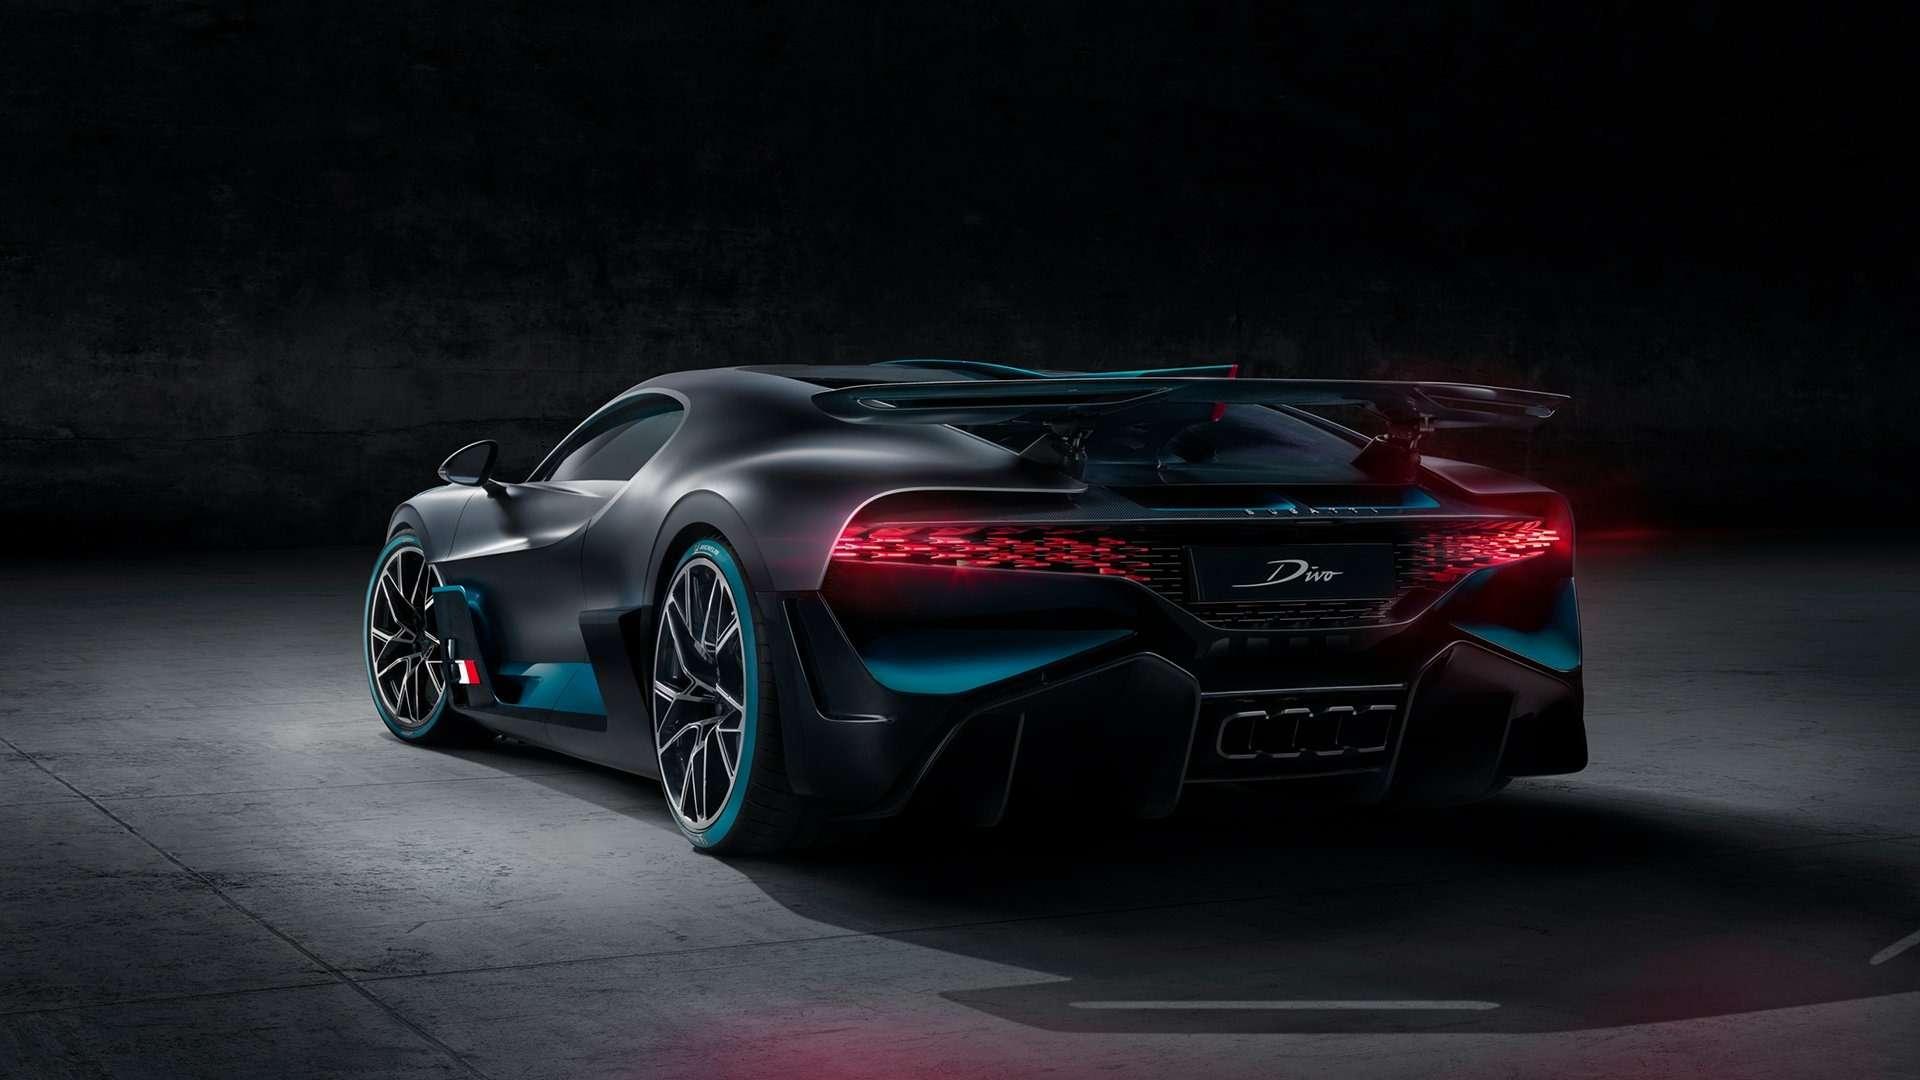 Bugatti Divo: настало время остановиться впогоне заскоростью имощностью?— фото 899247